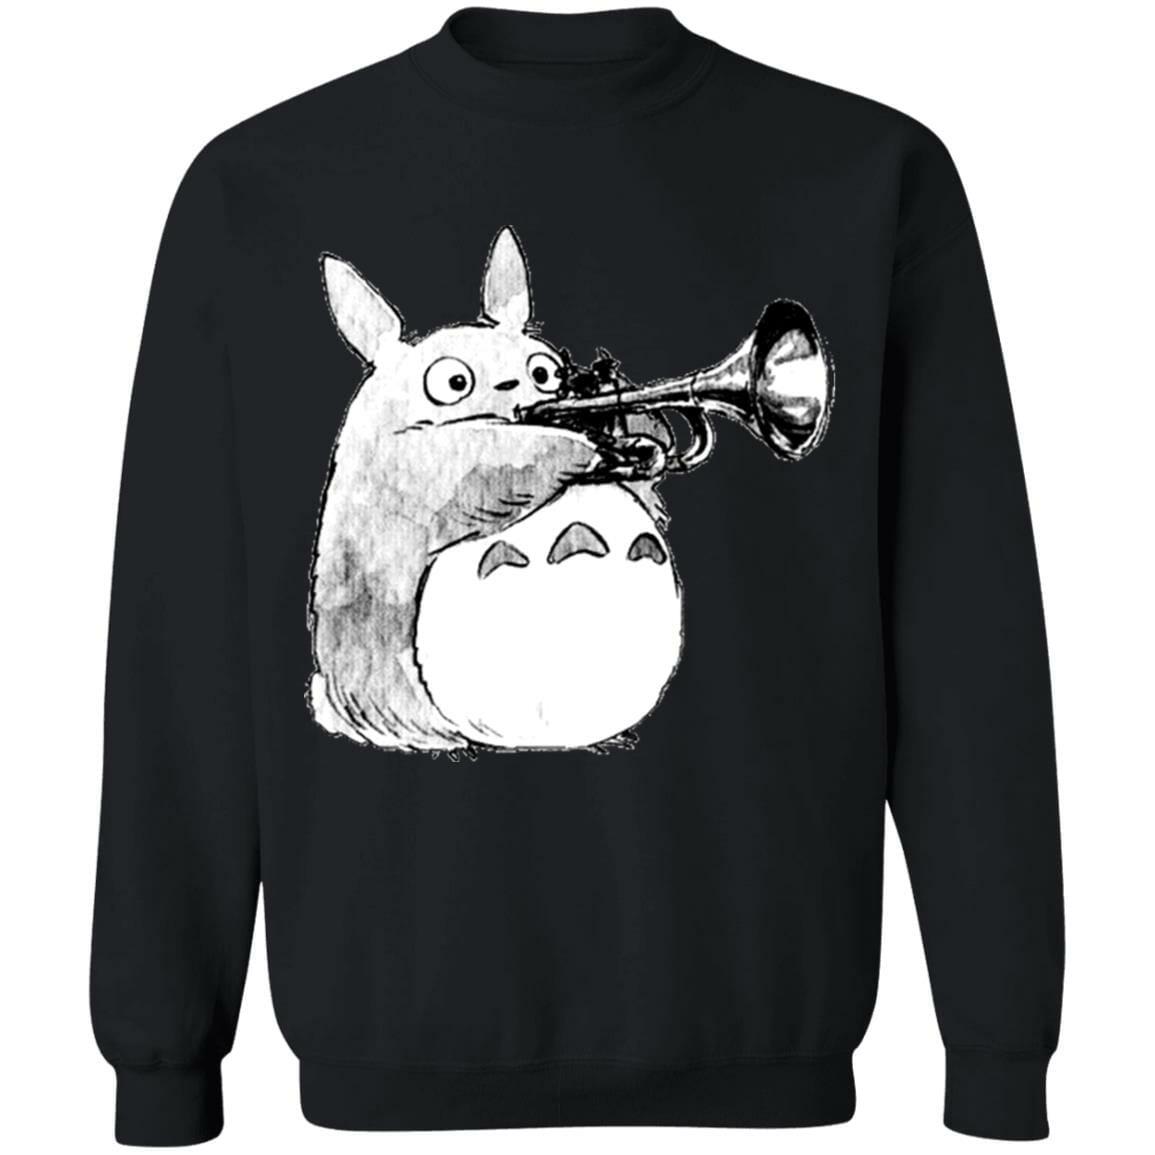 Totoro and the trumpet Sweatshirt